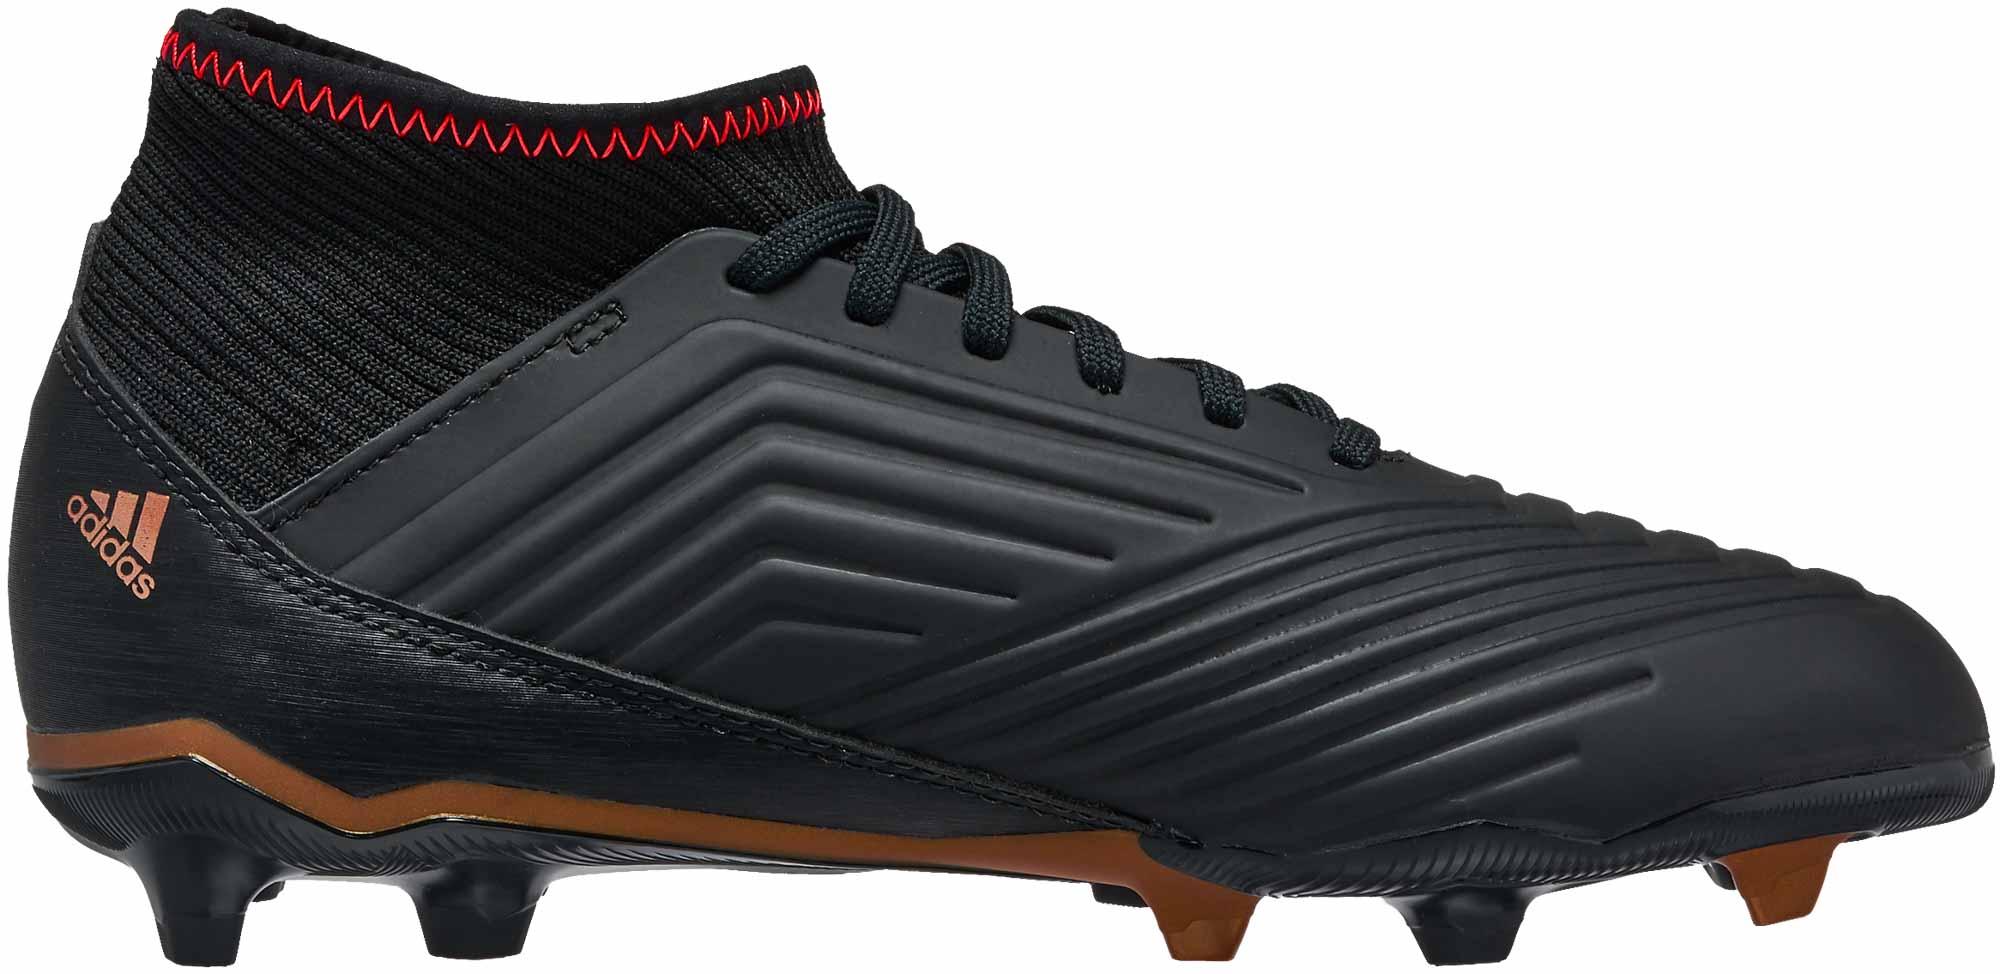 Adidas Zapatos De Fútbol Para Niños De Depredadores WvGSnG2lpH